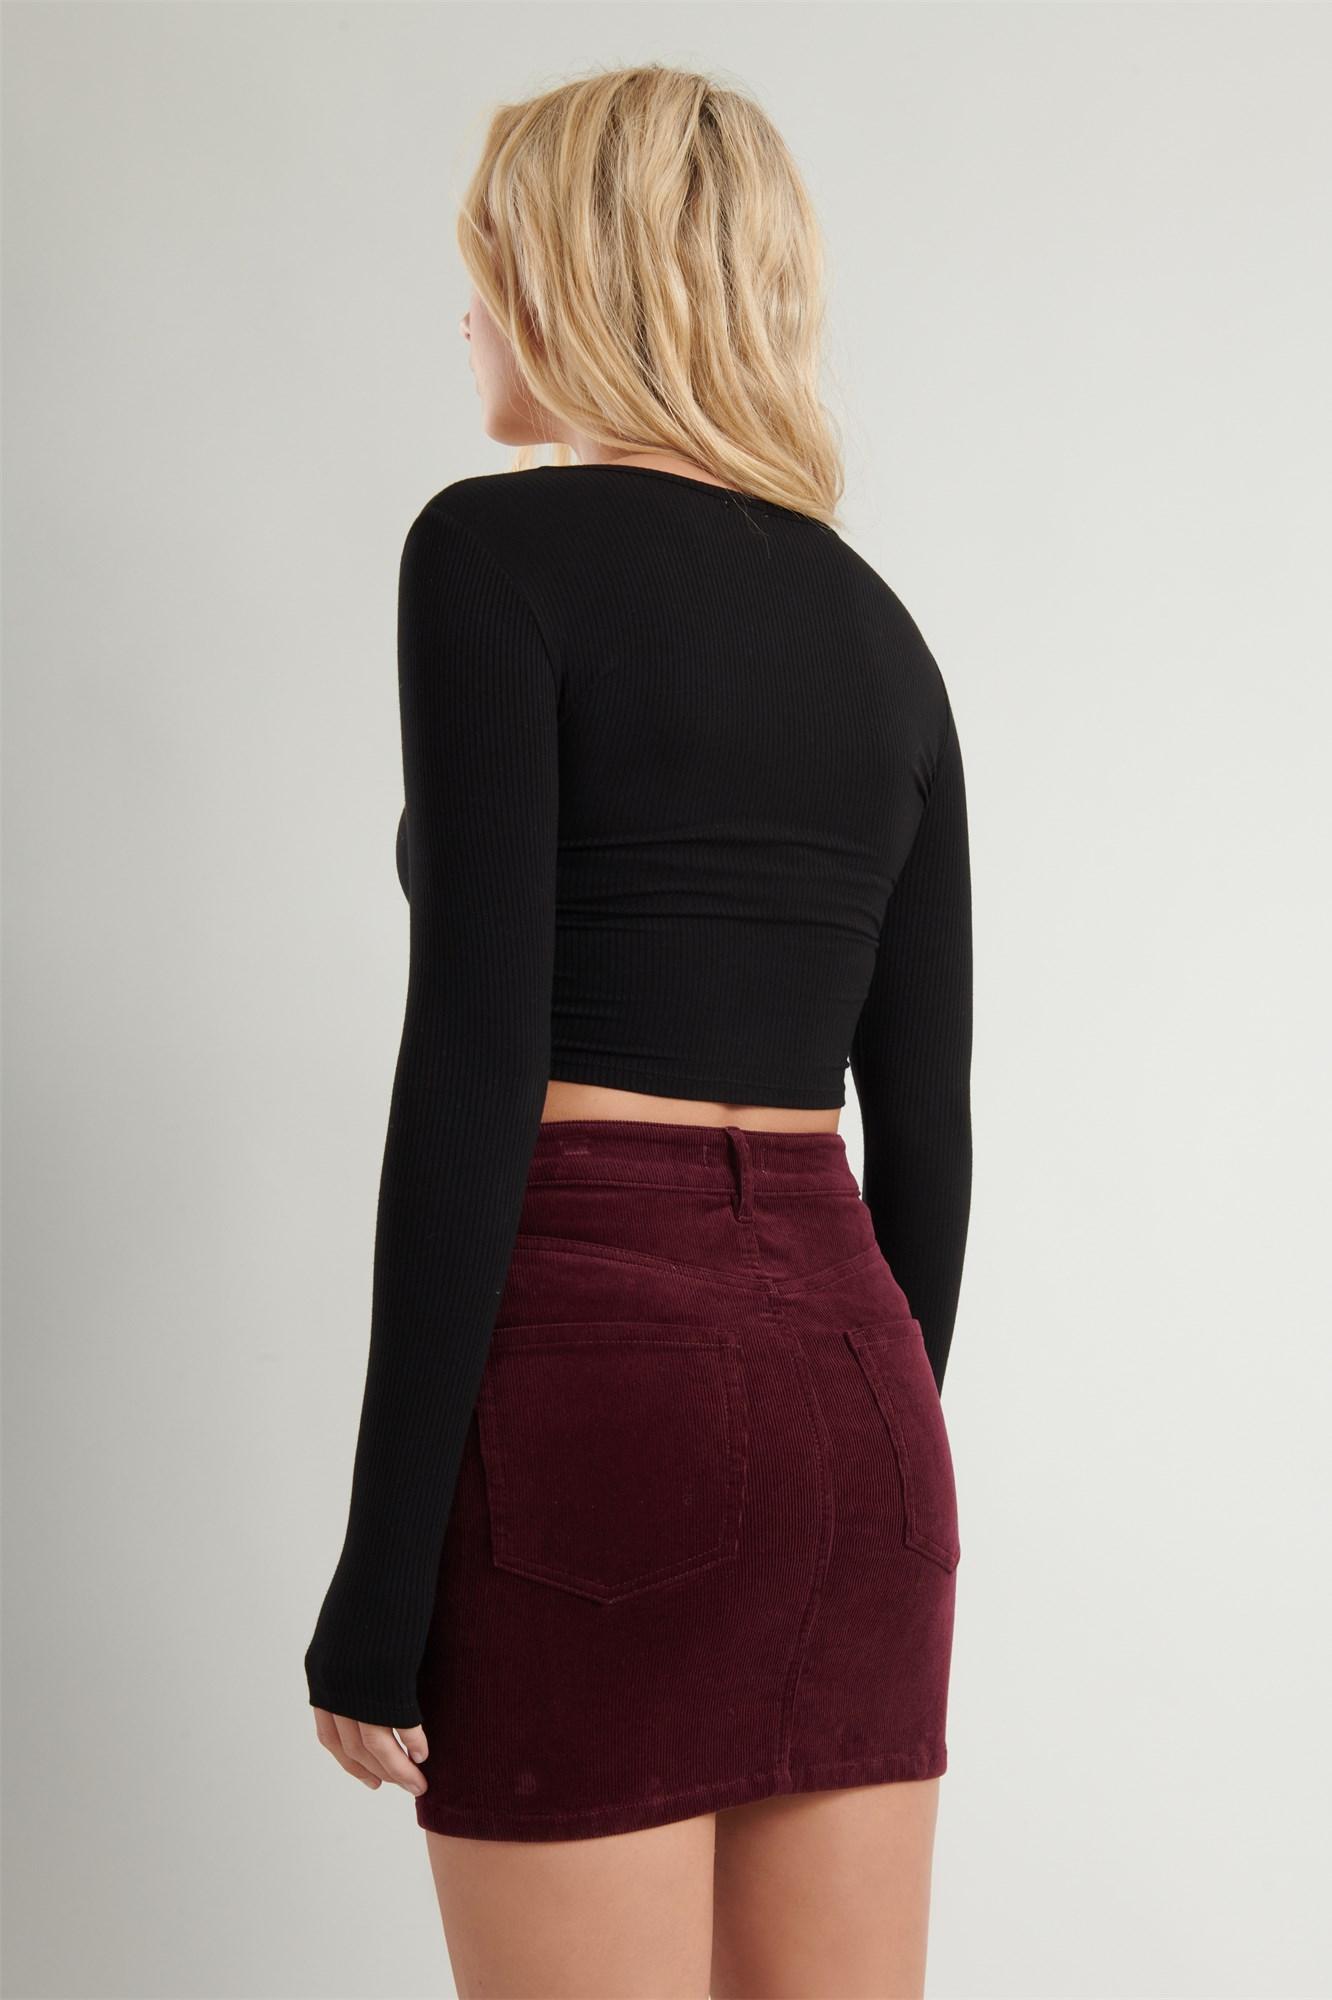 Image 4 of High Rise Corduroy Skirt